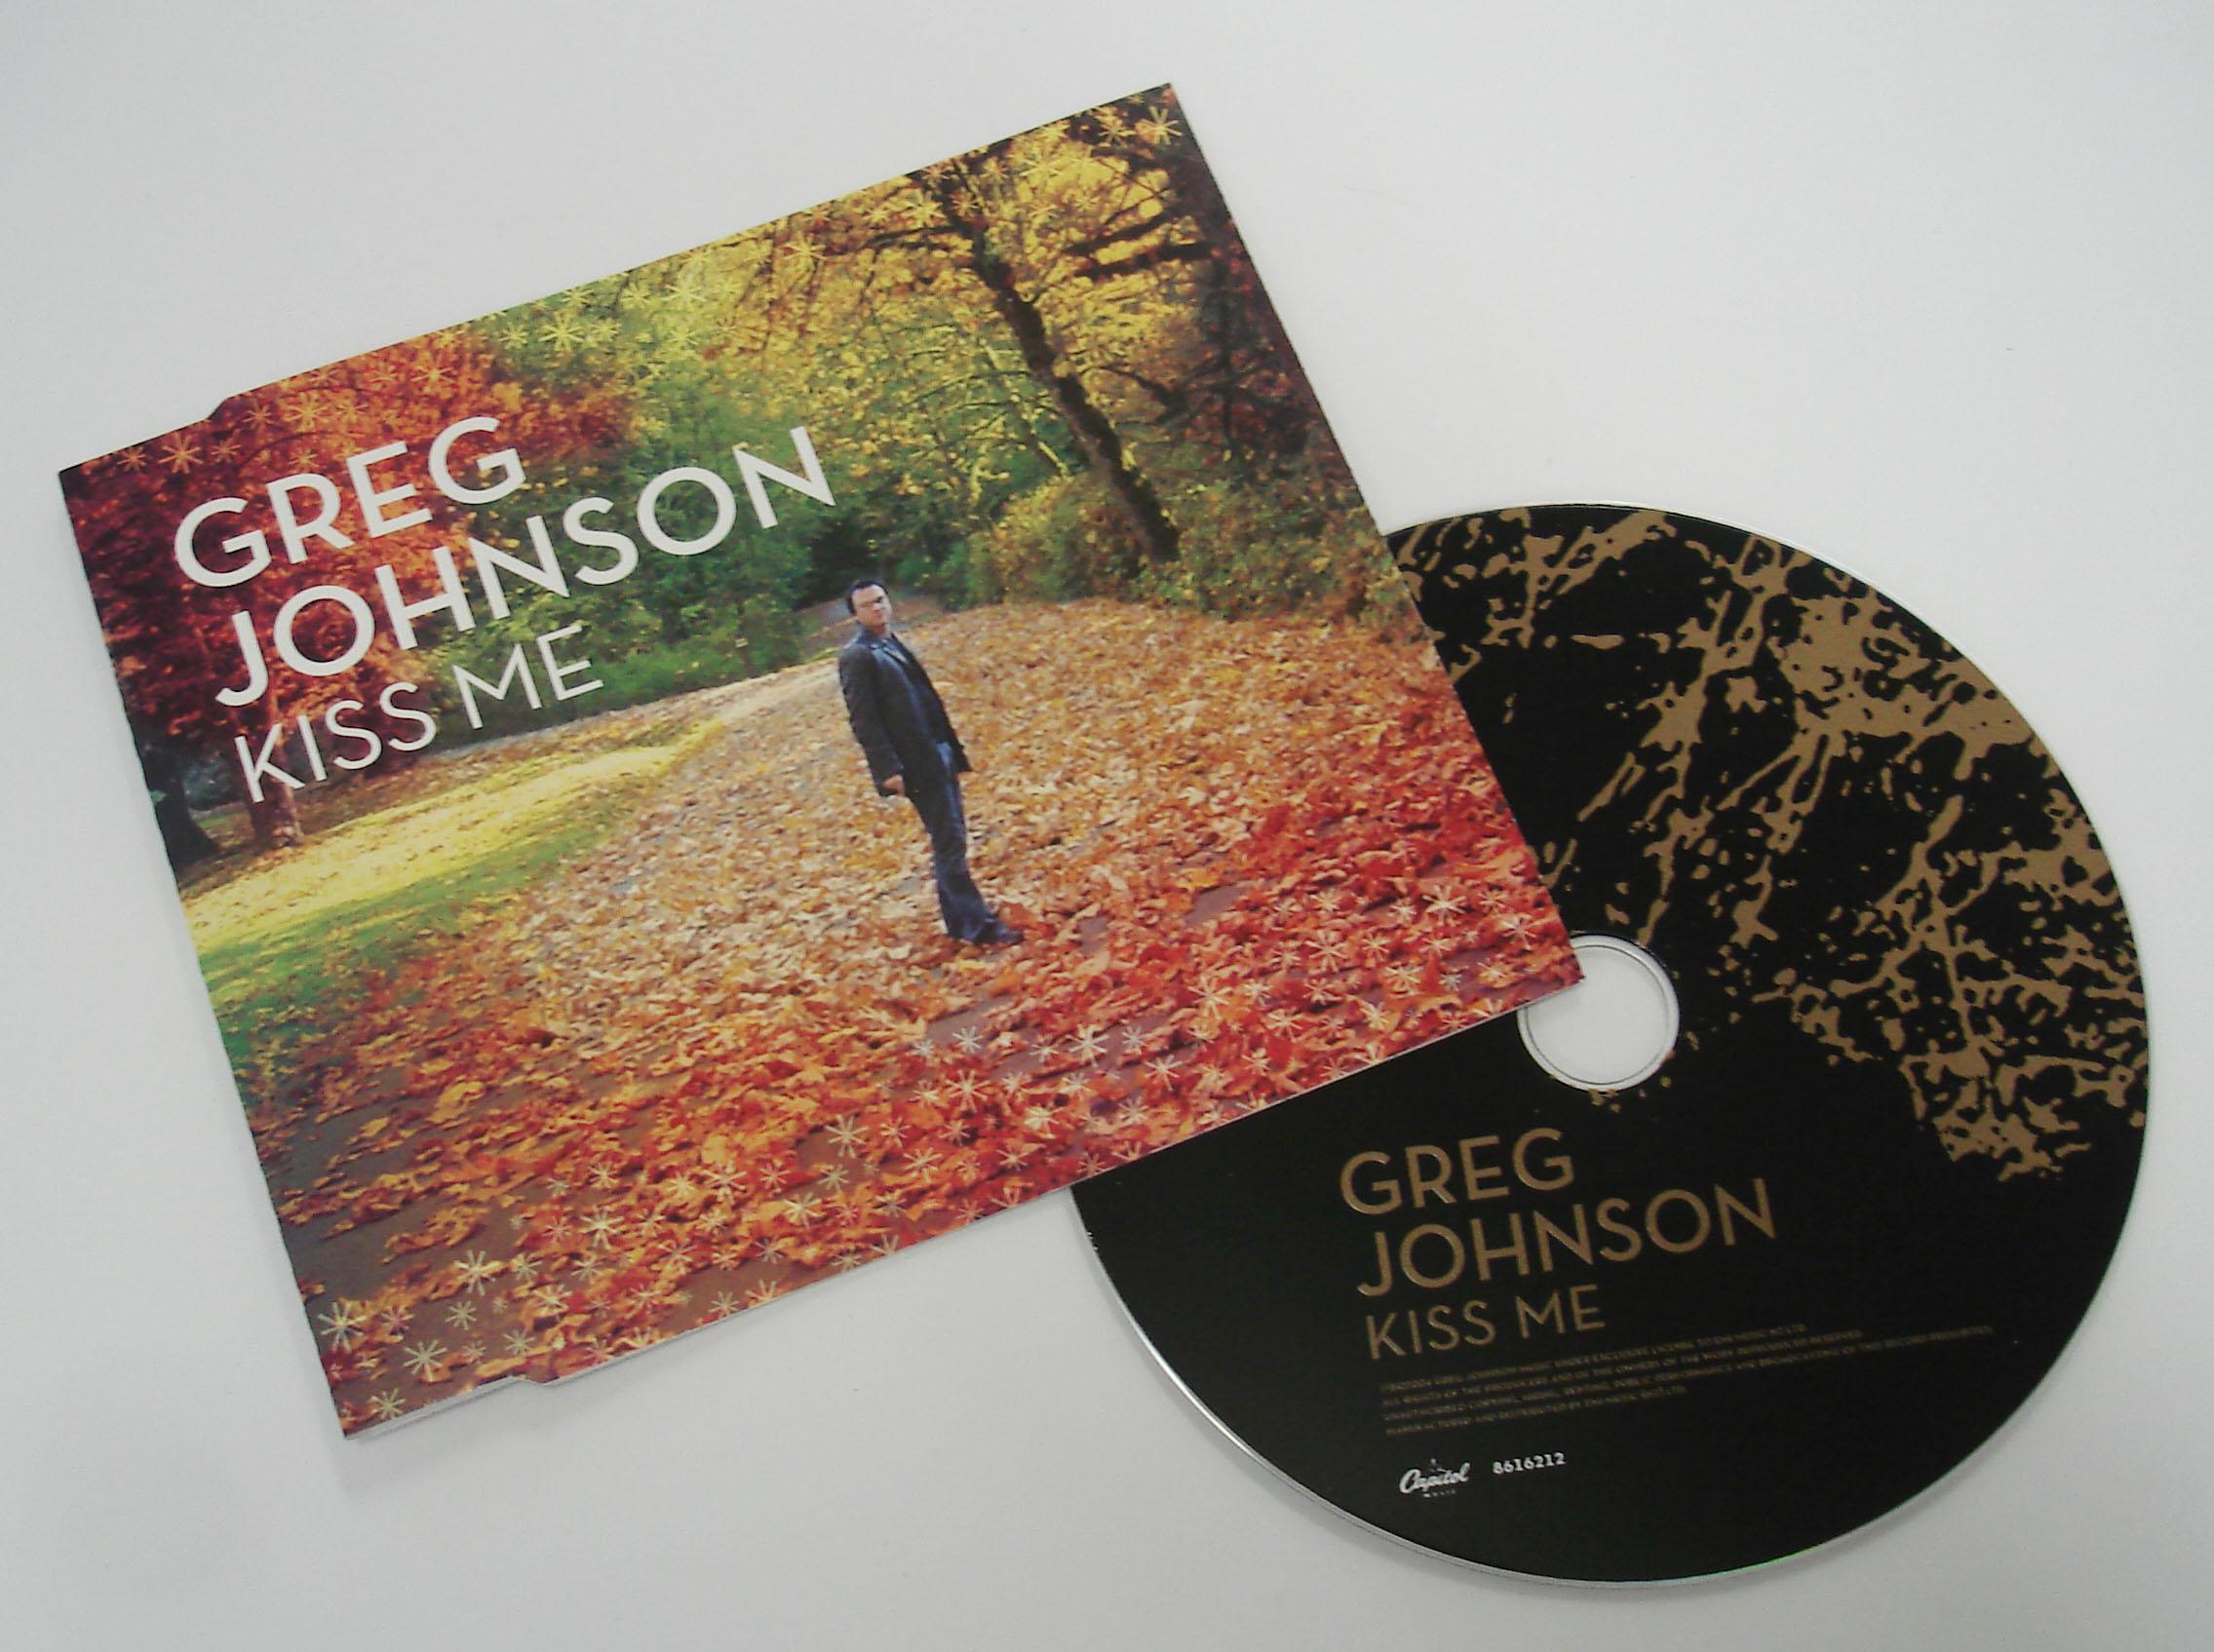 GREG JOHNSON - KISS ME - SINGLE